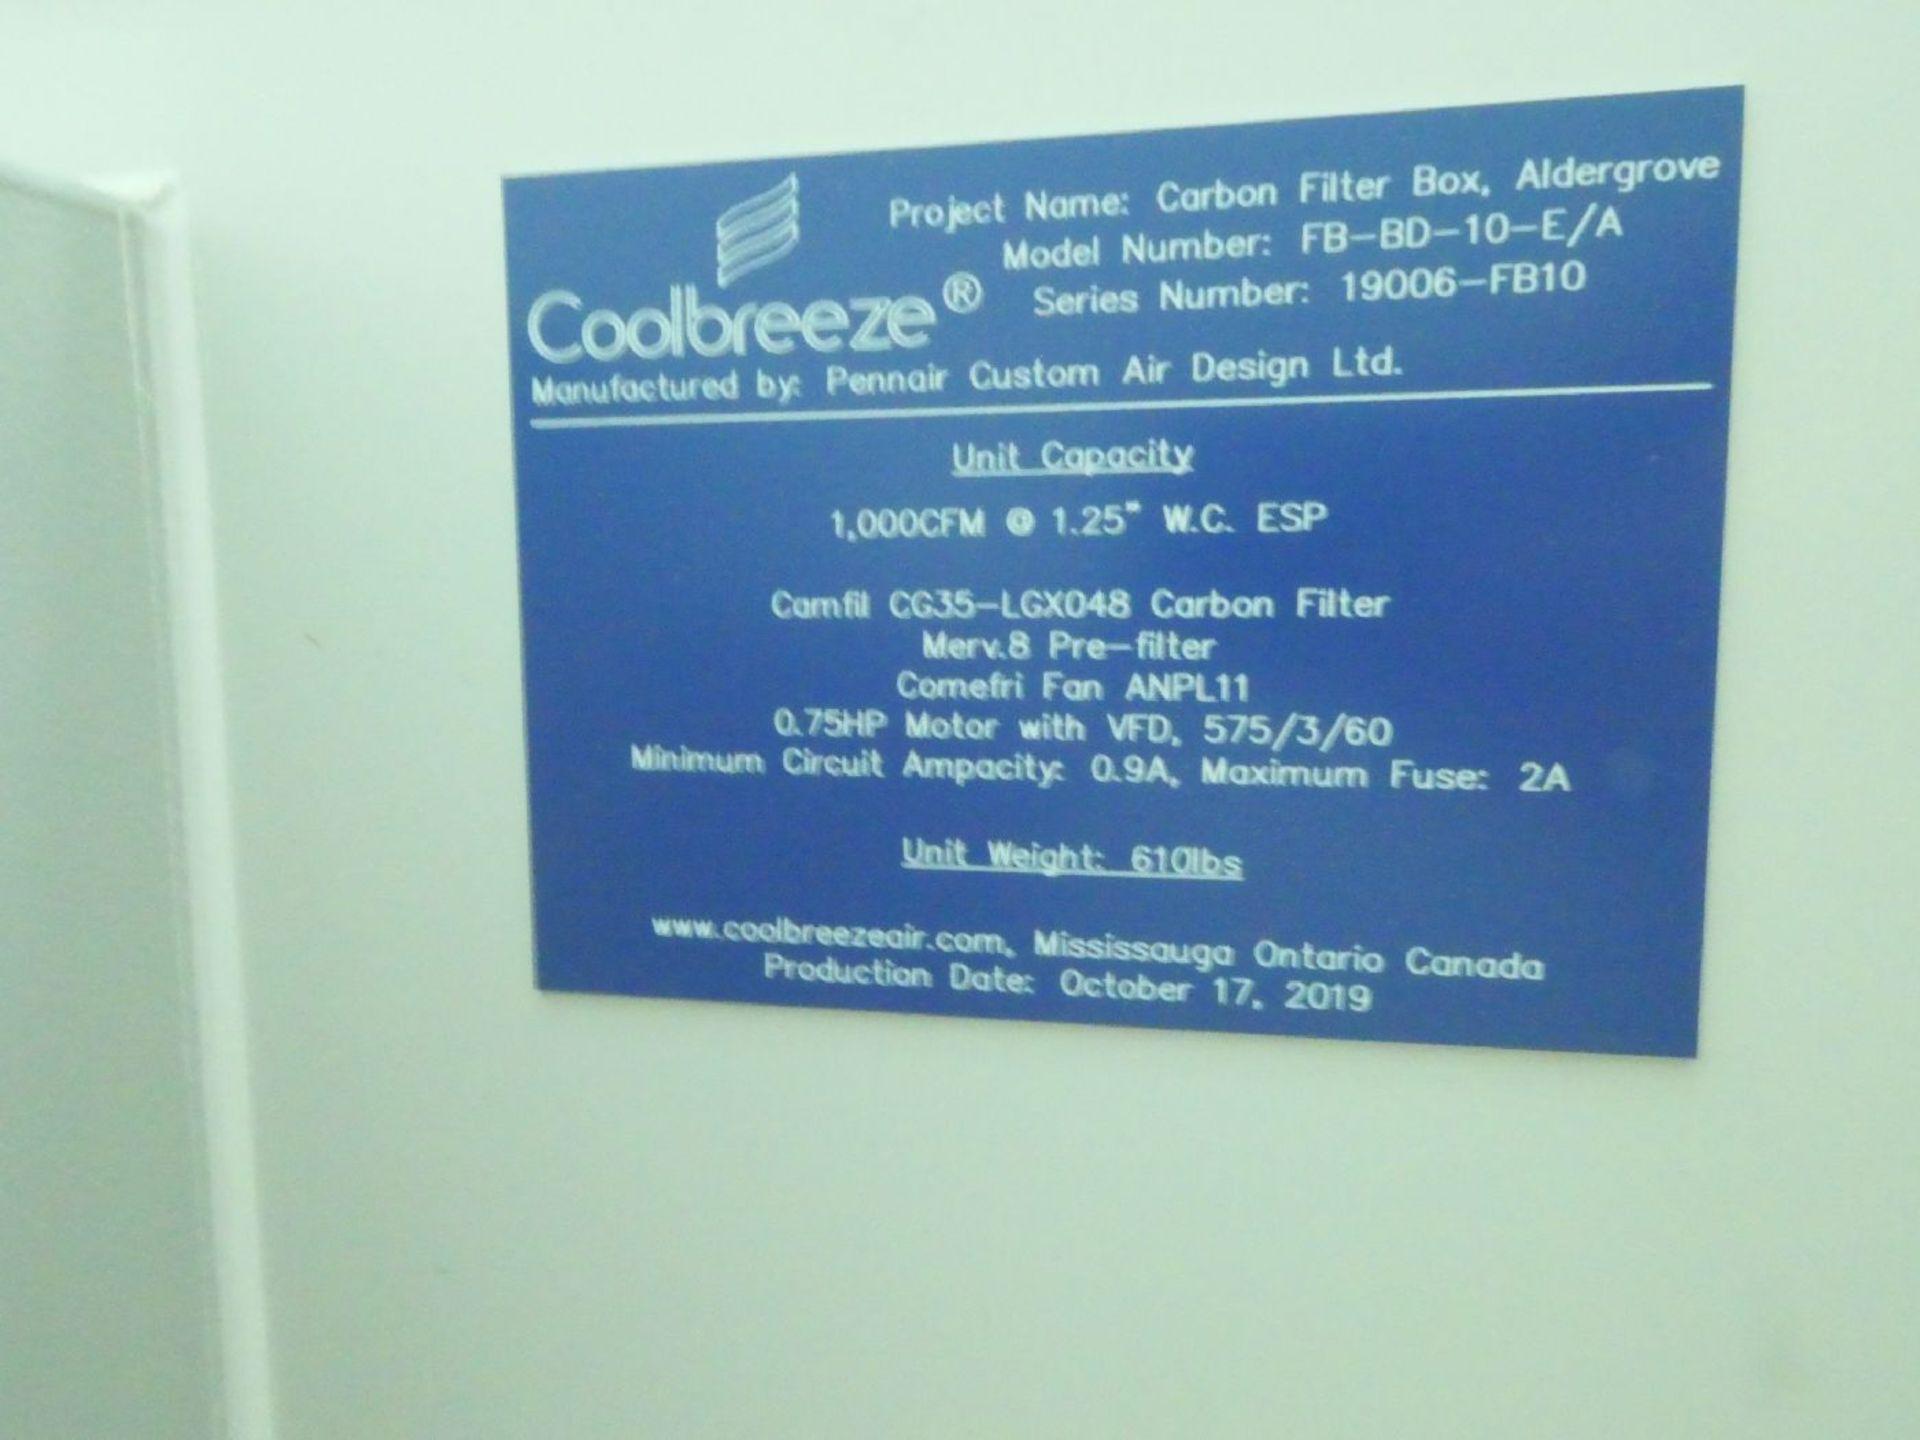 Pennair FB-BD-10-E/A Coolbreeze 1,000CFM Carbon Filter Box - Image 2 of 3